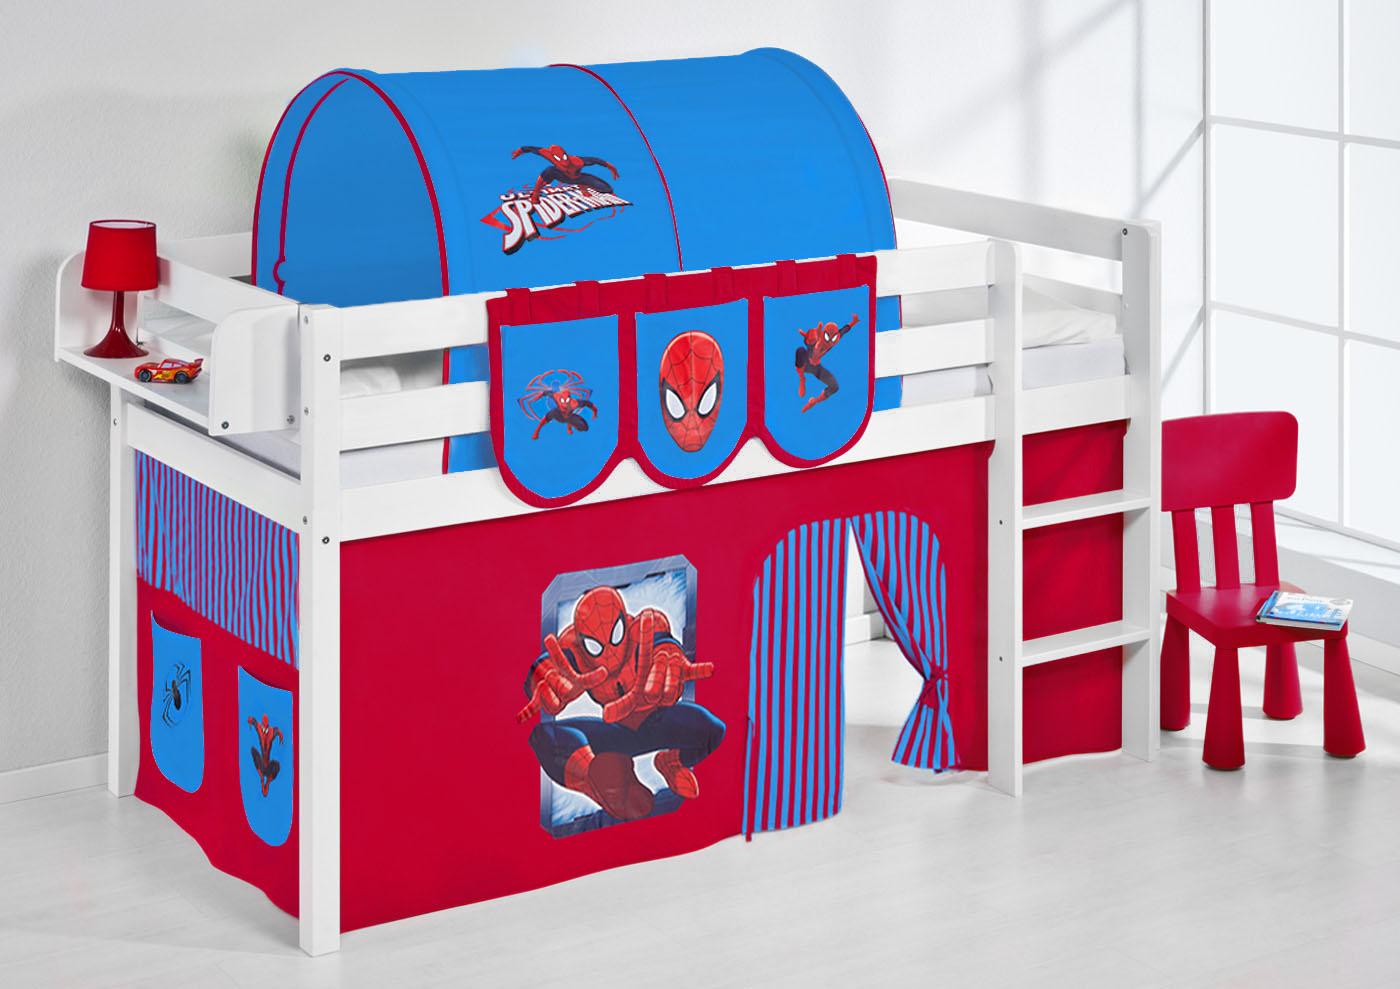 Hochbett Vorhang Set Mädchen : Spielbett hochbett kinderbett kinder bett jelle vorhang nach